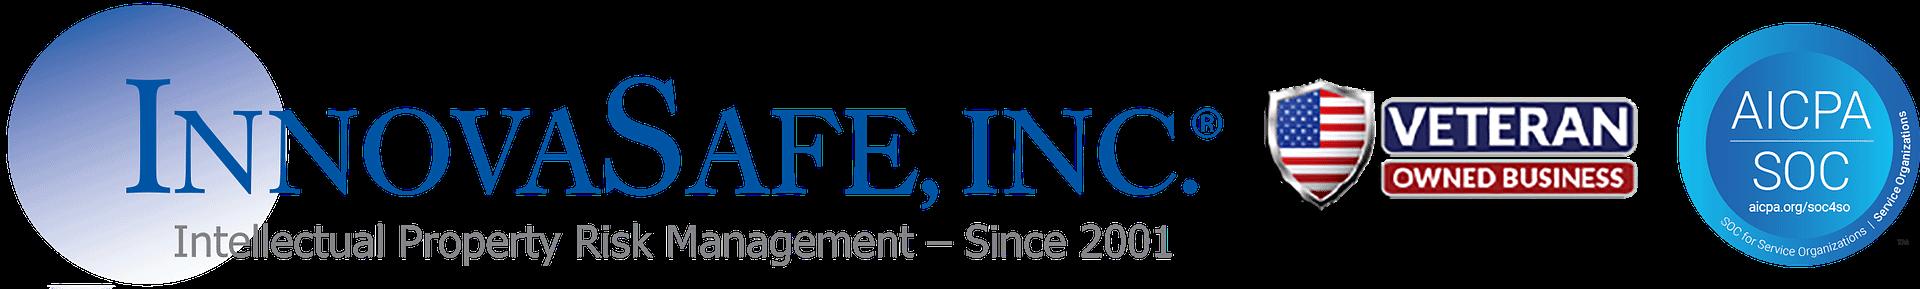 InnovaSafe Software Source Code Escrow